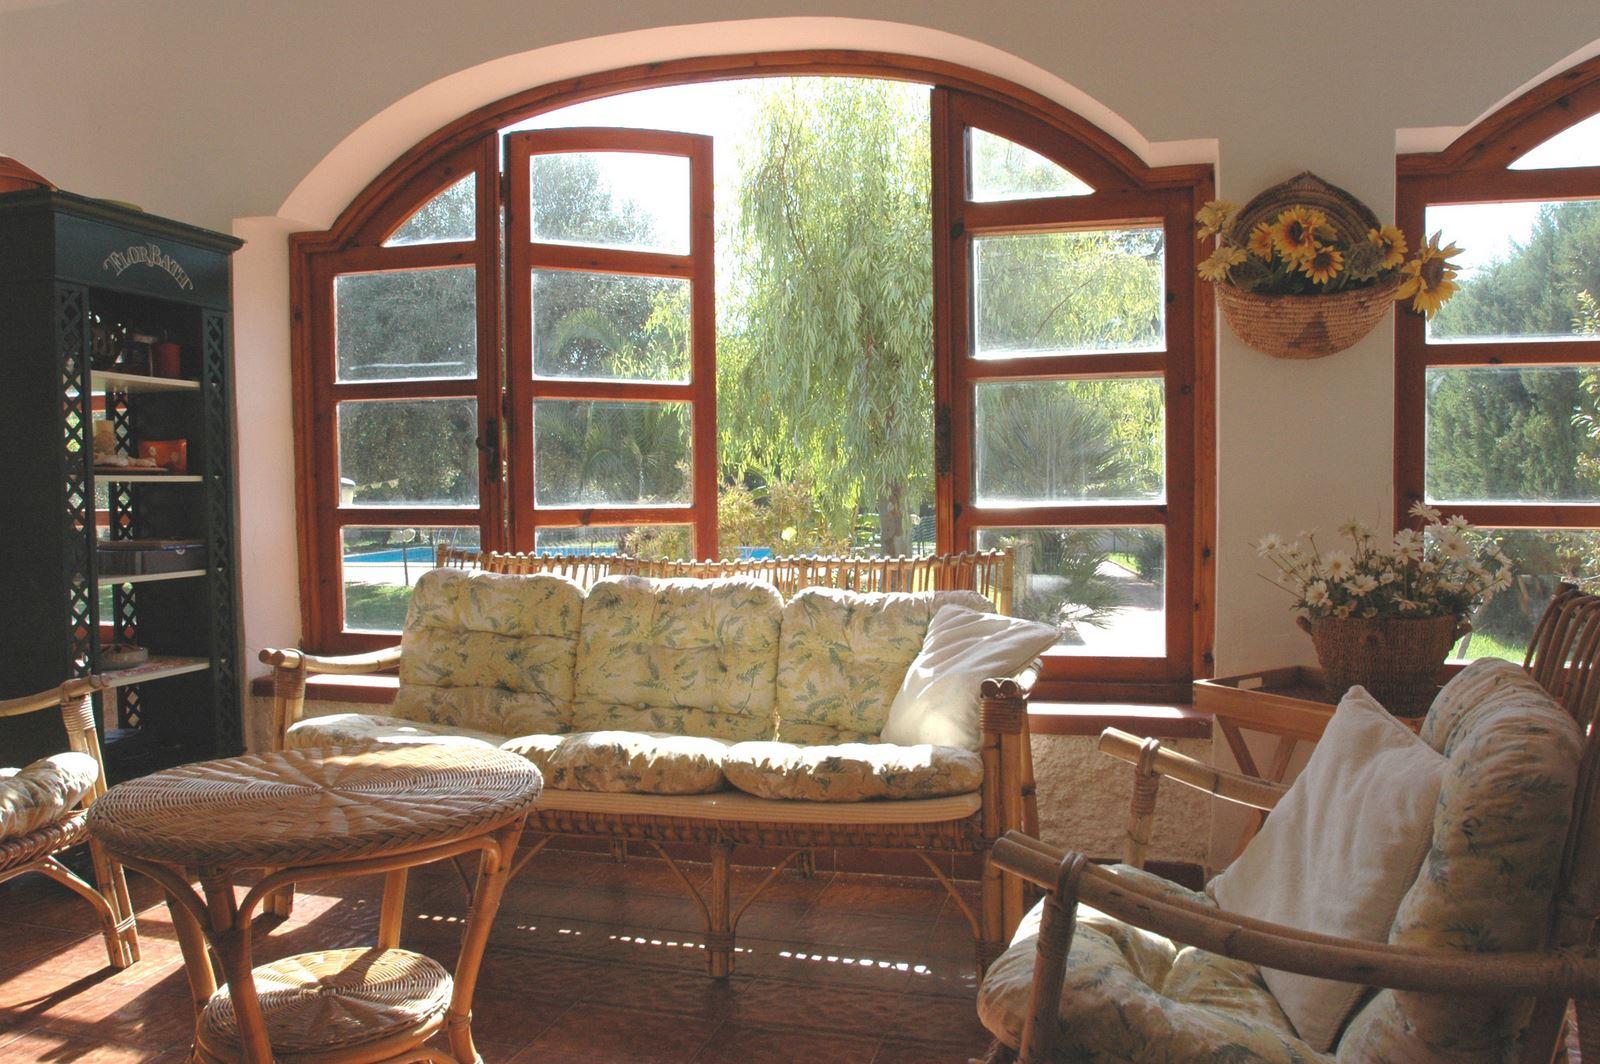 Maison de vacances Casa Fanusa (870904), Siracusa, Siracusa, Sicile, Italie, image 9